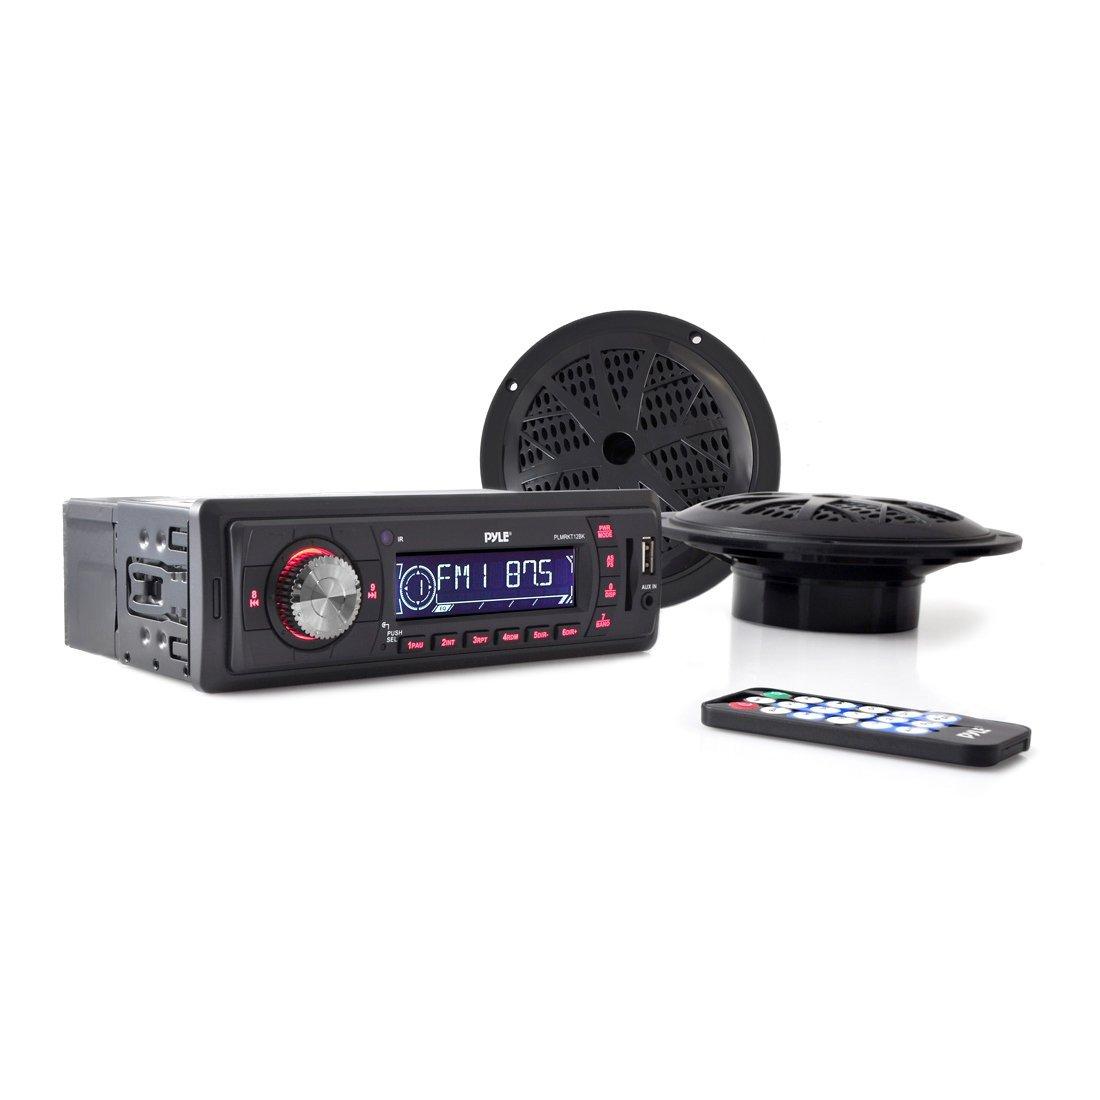 Marine Headunit Receiver Speaker Kit - In-Dash LCD Digital Stereo w/ AM FM Radio System 5.25'' Waterproof Cone Speakers (2) MP3/USB/SD Readers Aux Input Single DIN & Remote Control - Pyle PLMRKT12BK